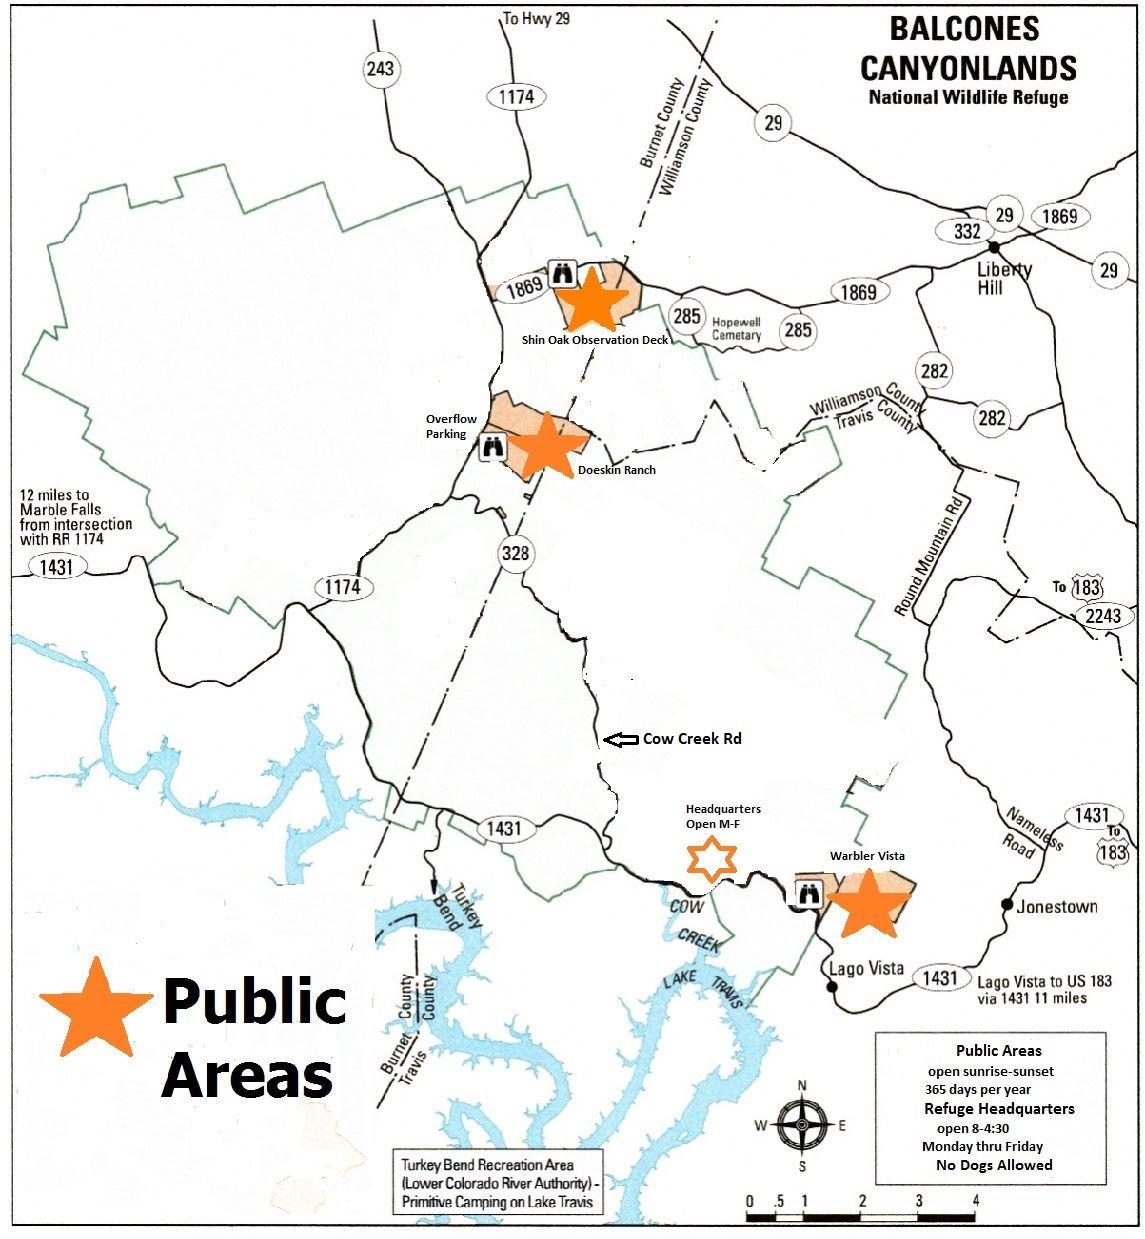 Friends Of Balcones Nwr - Maps - Texas Wildlife Refuge Map